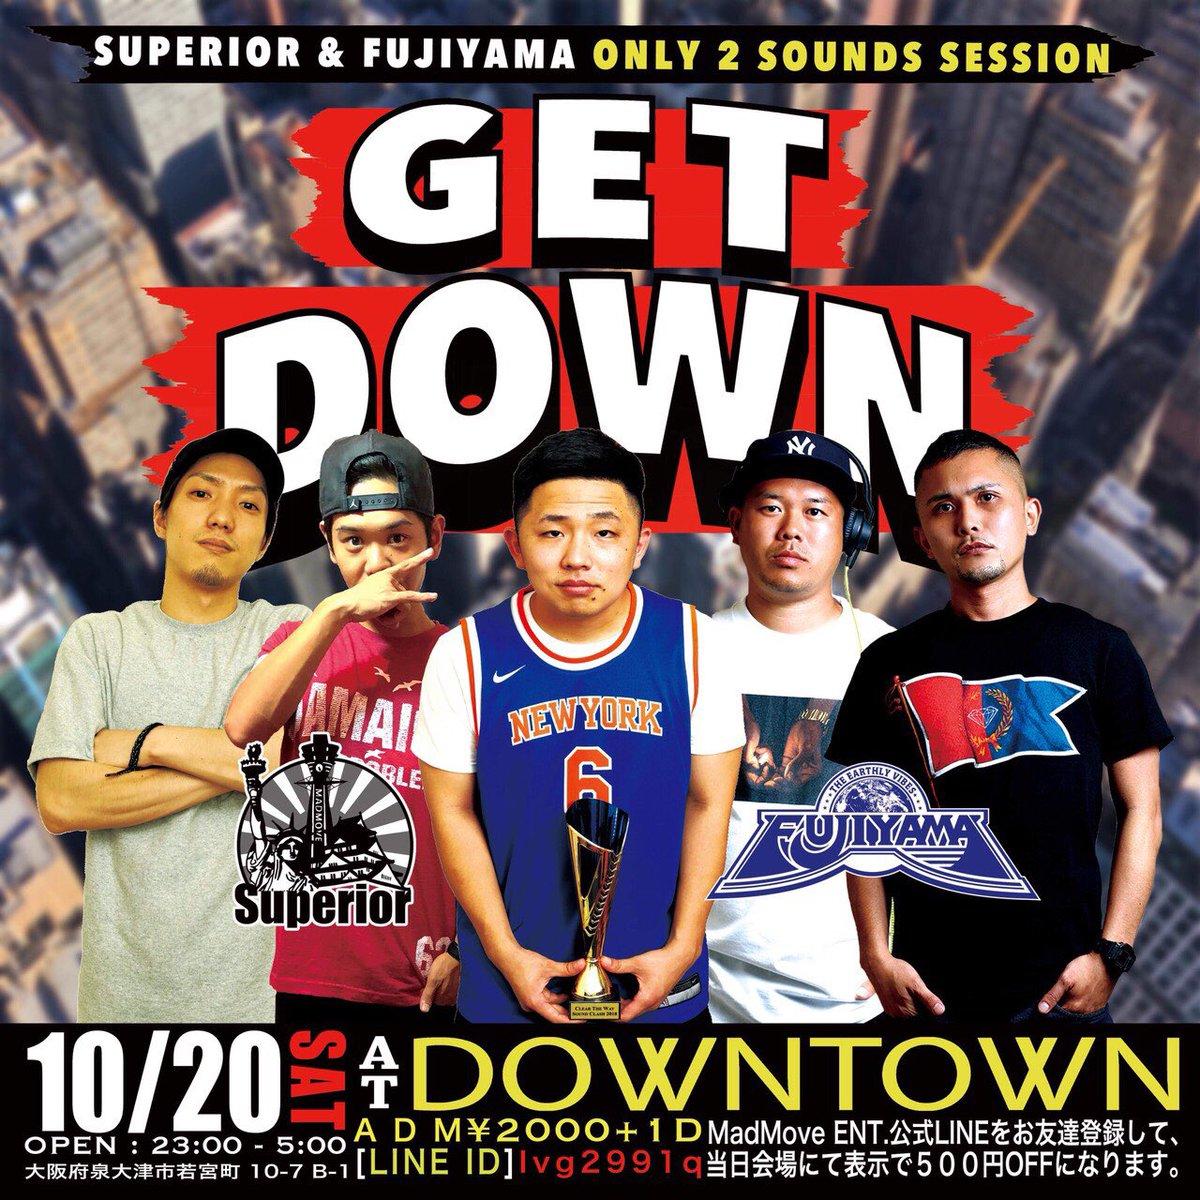 💥【Get Down】💥 10.20.2018 (Sat) @downtown0725   Superior × Fujiyama 2Sound Session🔥  若い子達には特に来て欲しい。  MadMove EntのLine@に登録してもらえたら前売り値段で入れます!  #Superior #MadMoveEnt